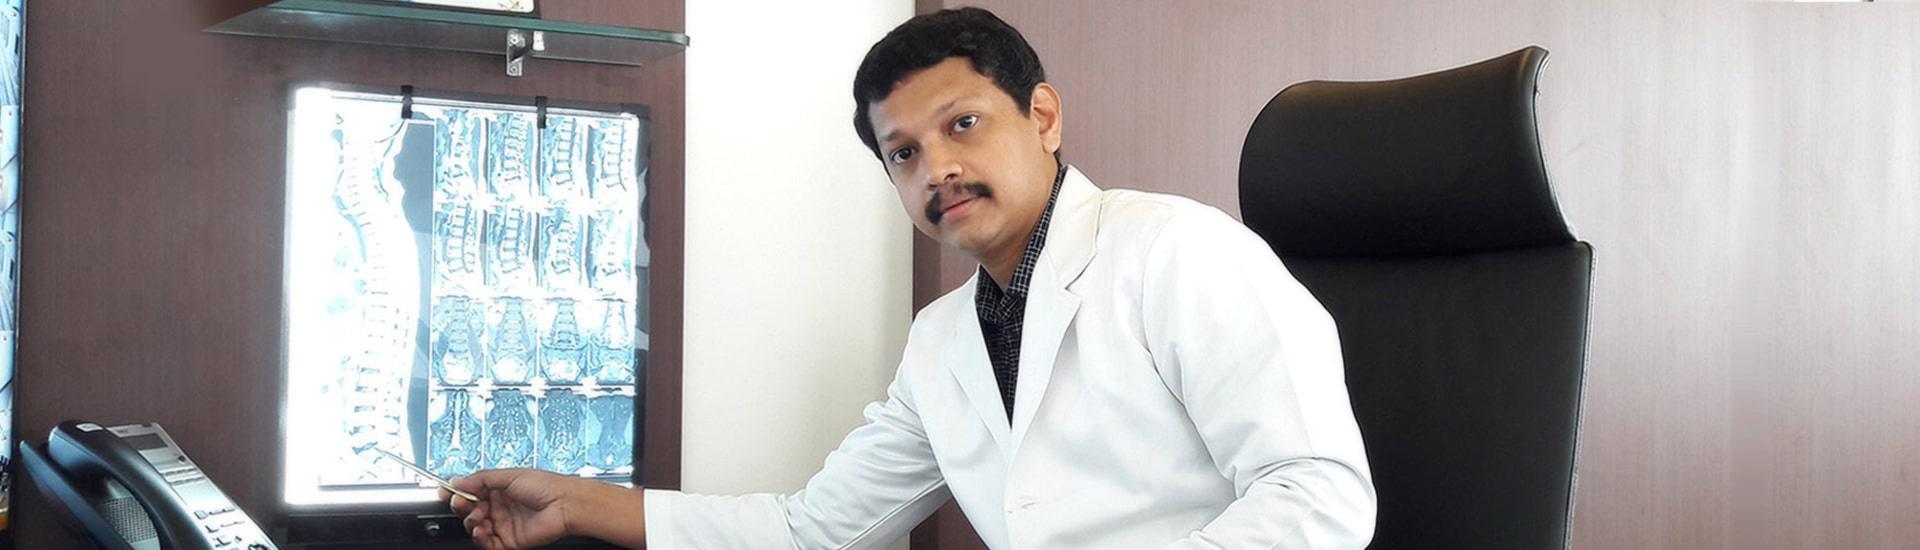 Best Spine care centre in India, Spine Specialist Dr Robin Guru Singh